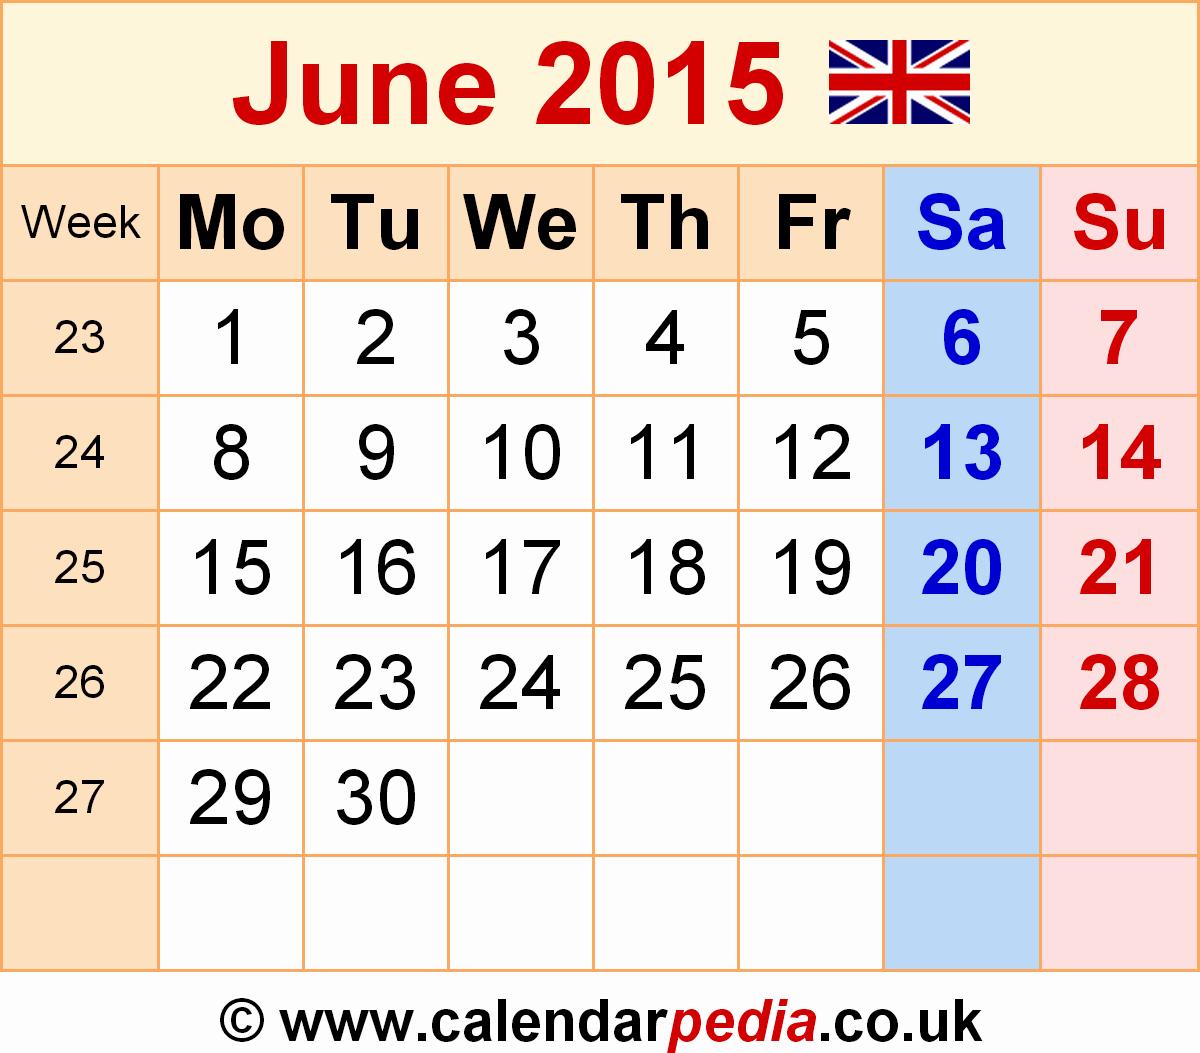 Calendar Template for June 2015 Fresh Calendar June 2015 Uk Bank Holidays Excel Pdf Word Templates